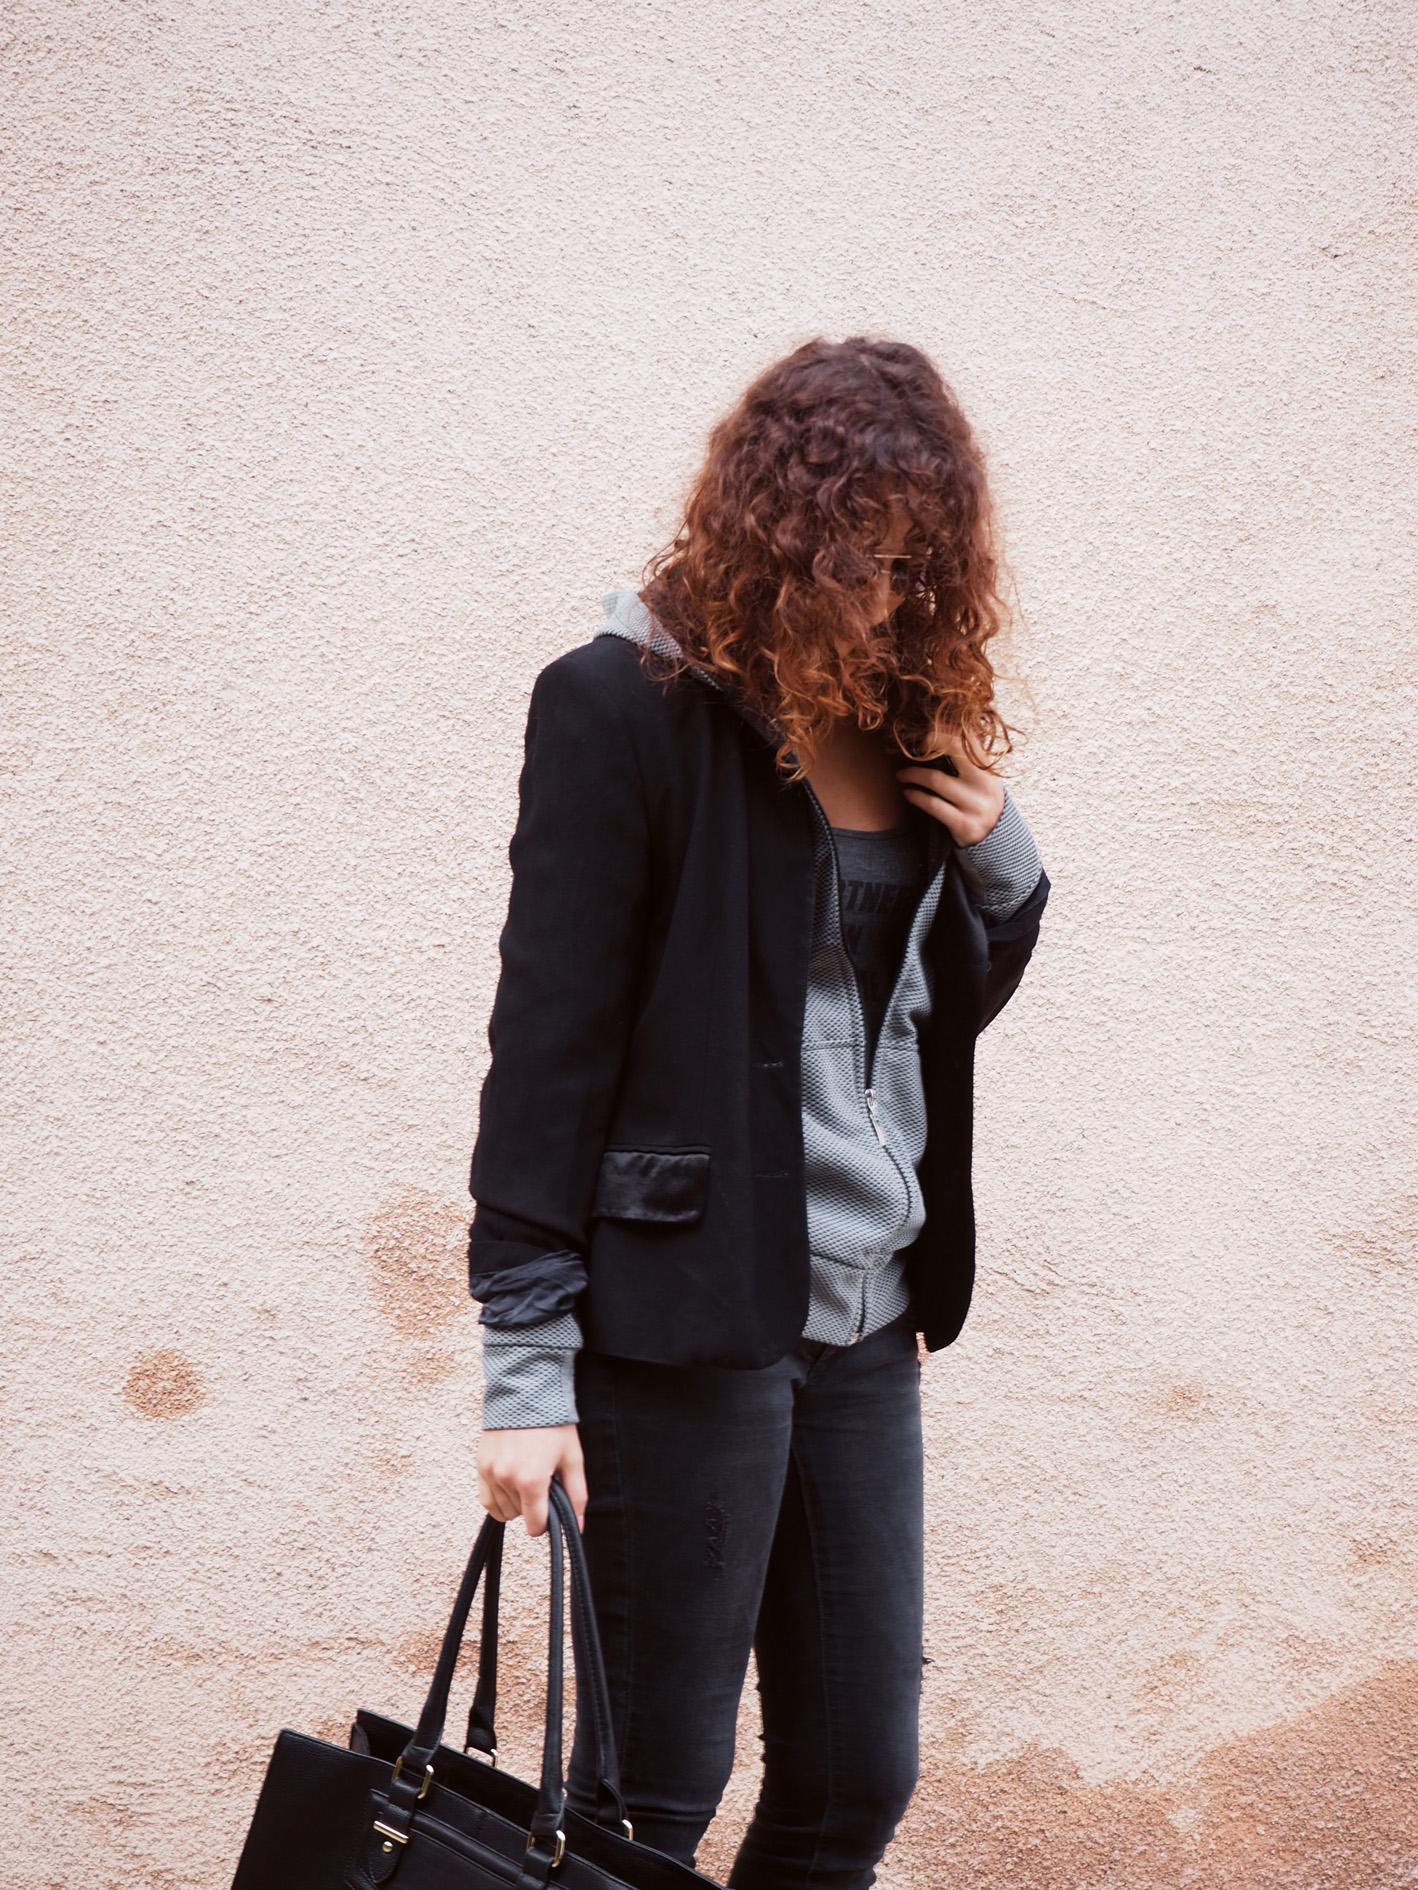 look automne femme women style cheveux boucles coiffeur jean louis david veste classique basic streewear sportswear bcbg jean vero moda sport body undiz